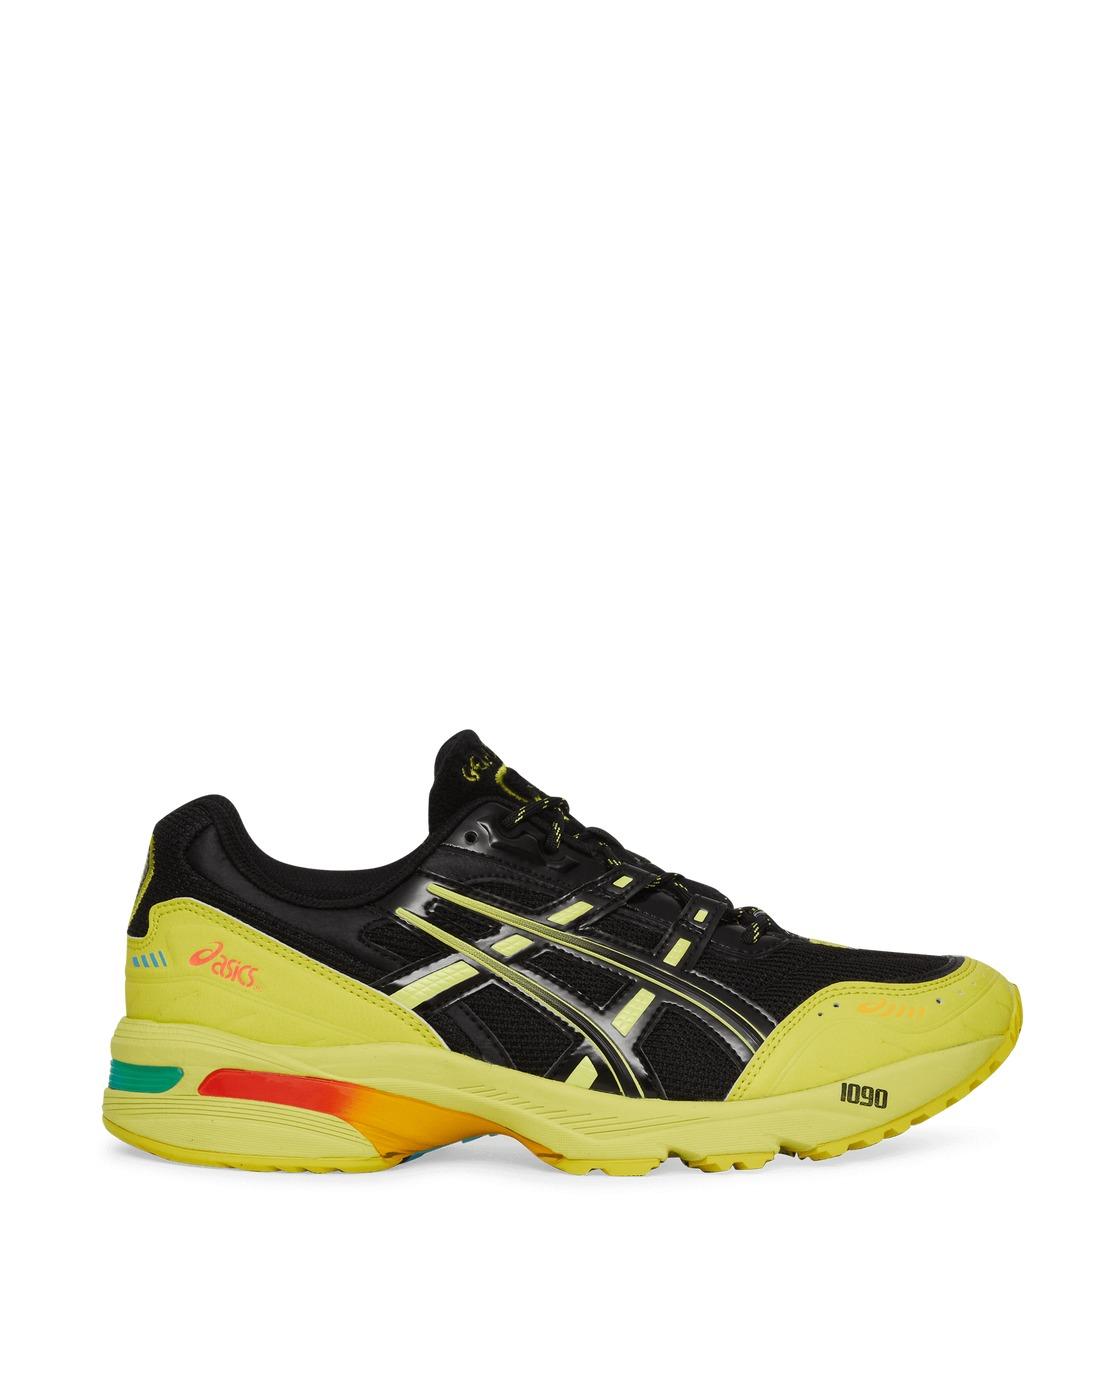 Asics Iab Studio Gel 1090 Sneakers Black/Lime Zest